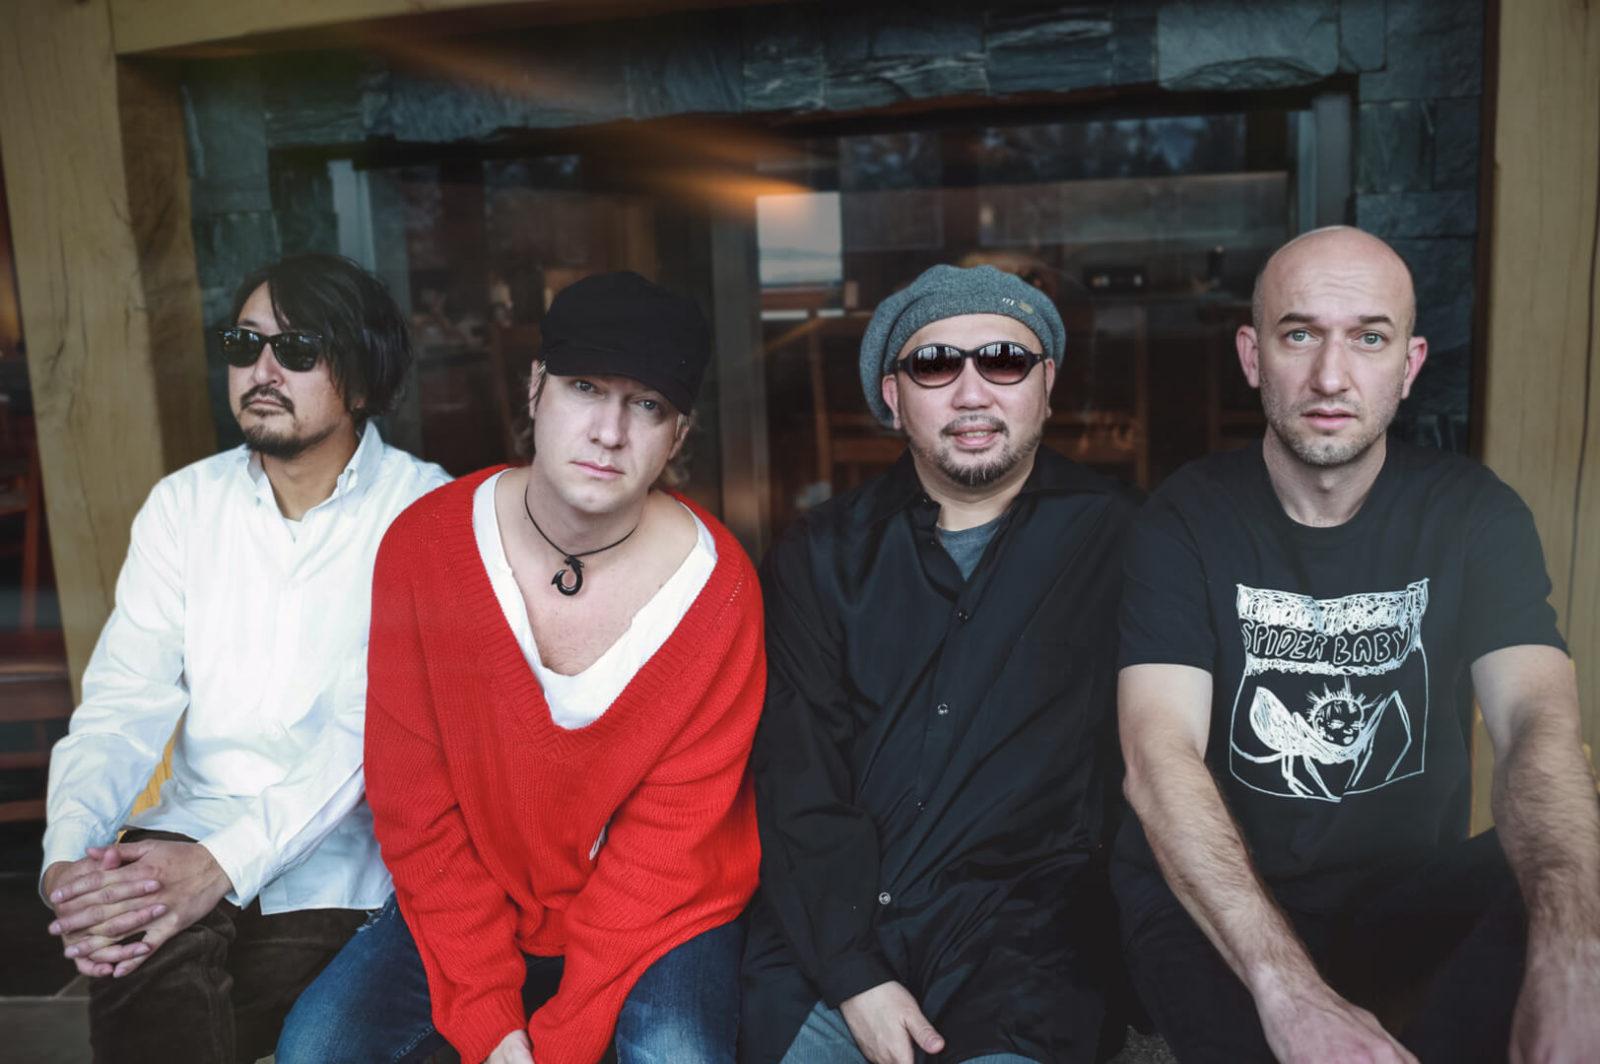 MONKEY MAJIK、最新アルバムより3週連続となる楽曲先行配信が決定&リリース記念イベントの実施もサムネイル画像